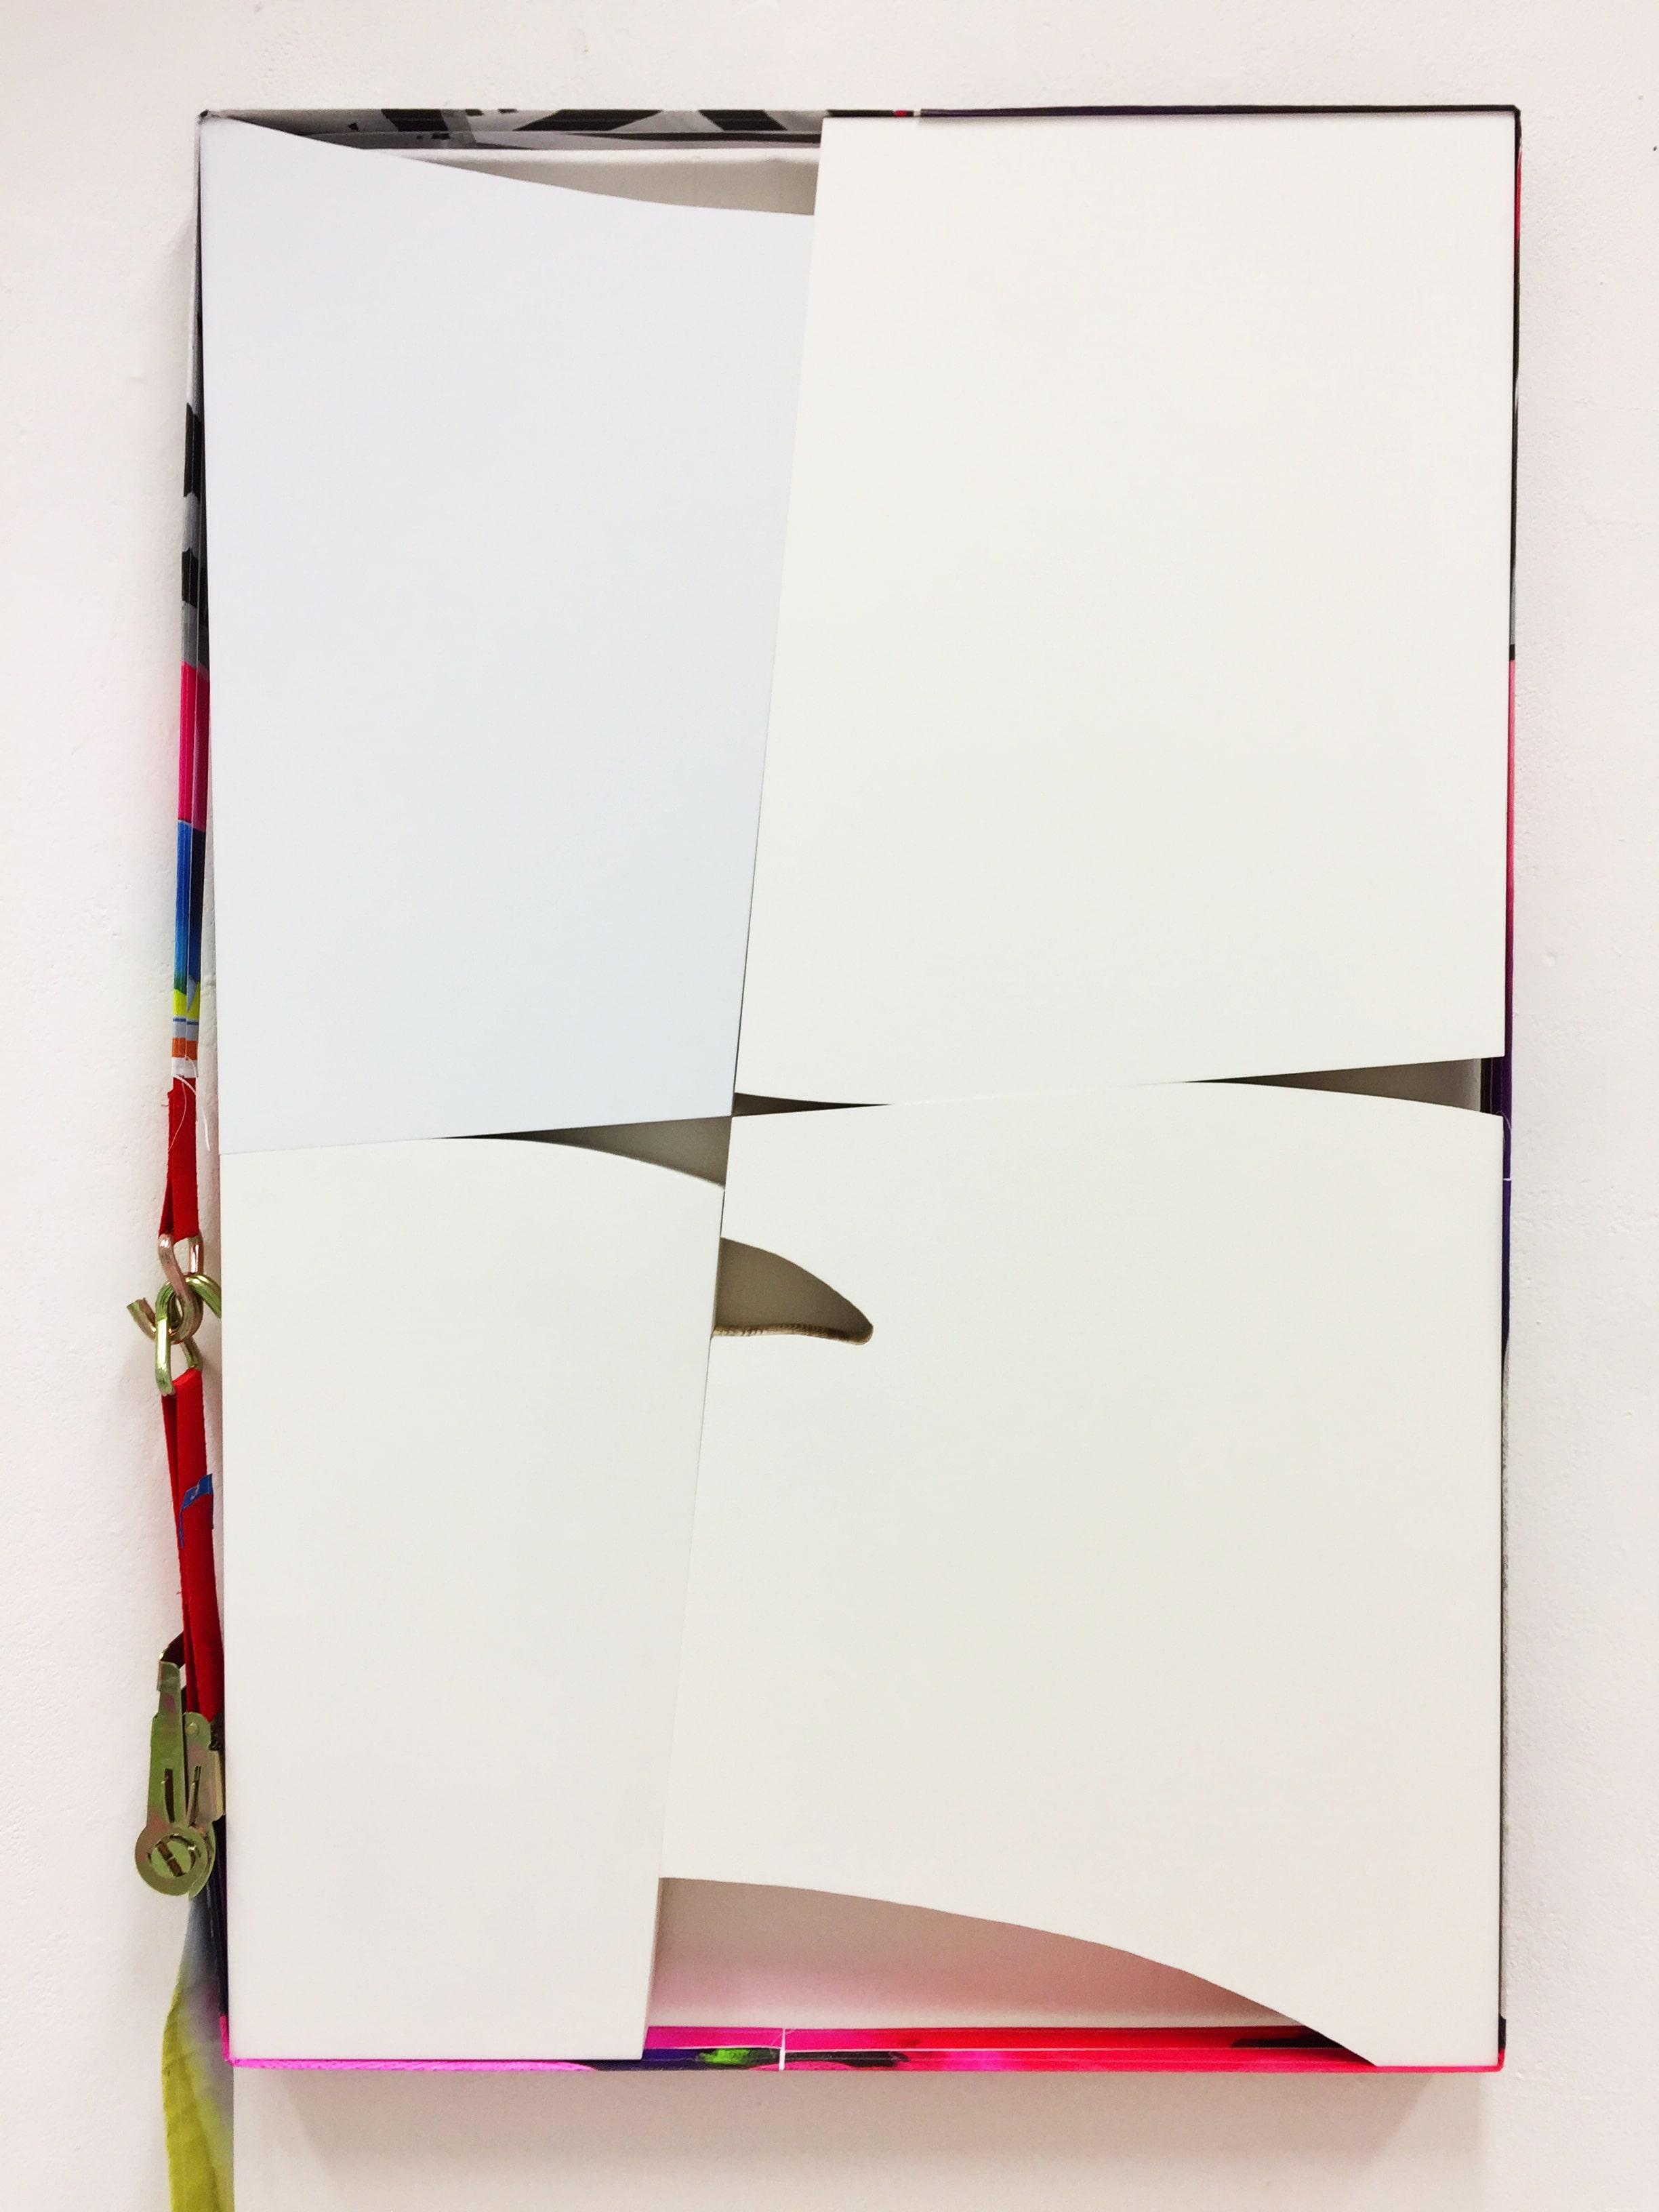 NemesM_Temporary-Edges-05_2018_120x96cm_acrylic-gesso-varnish-offset-print-cargo-strap-wood-min